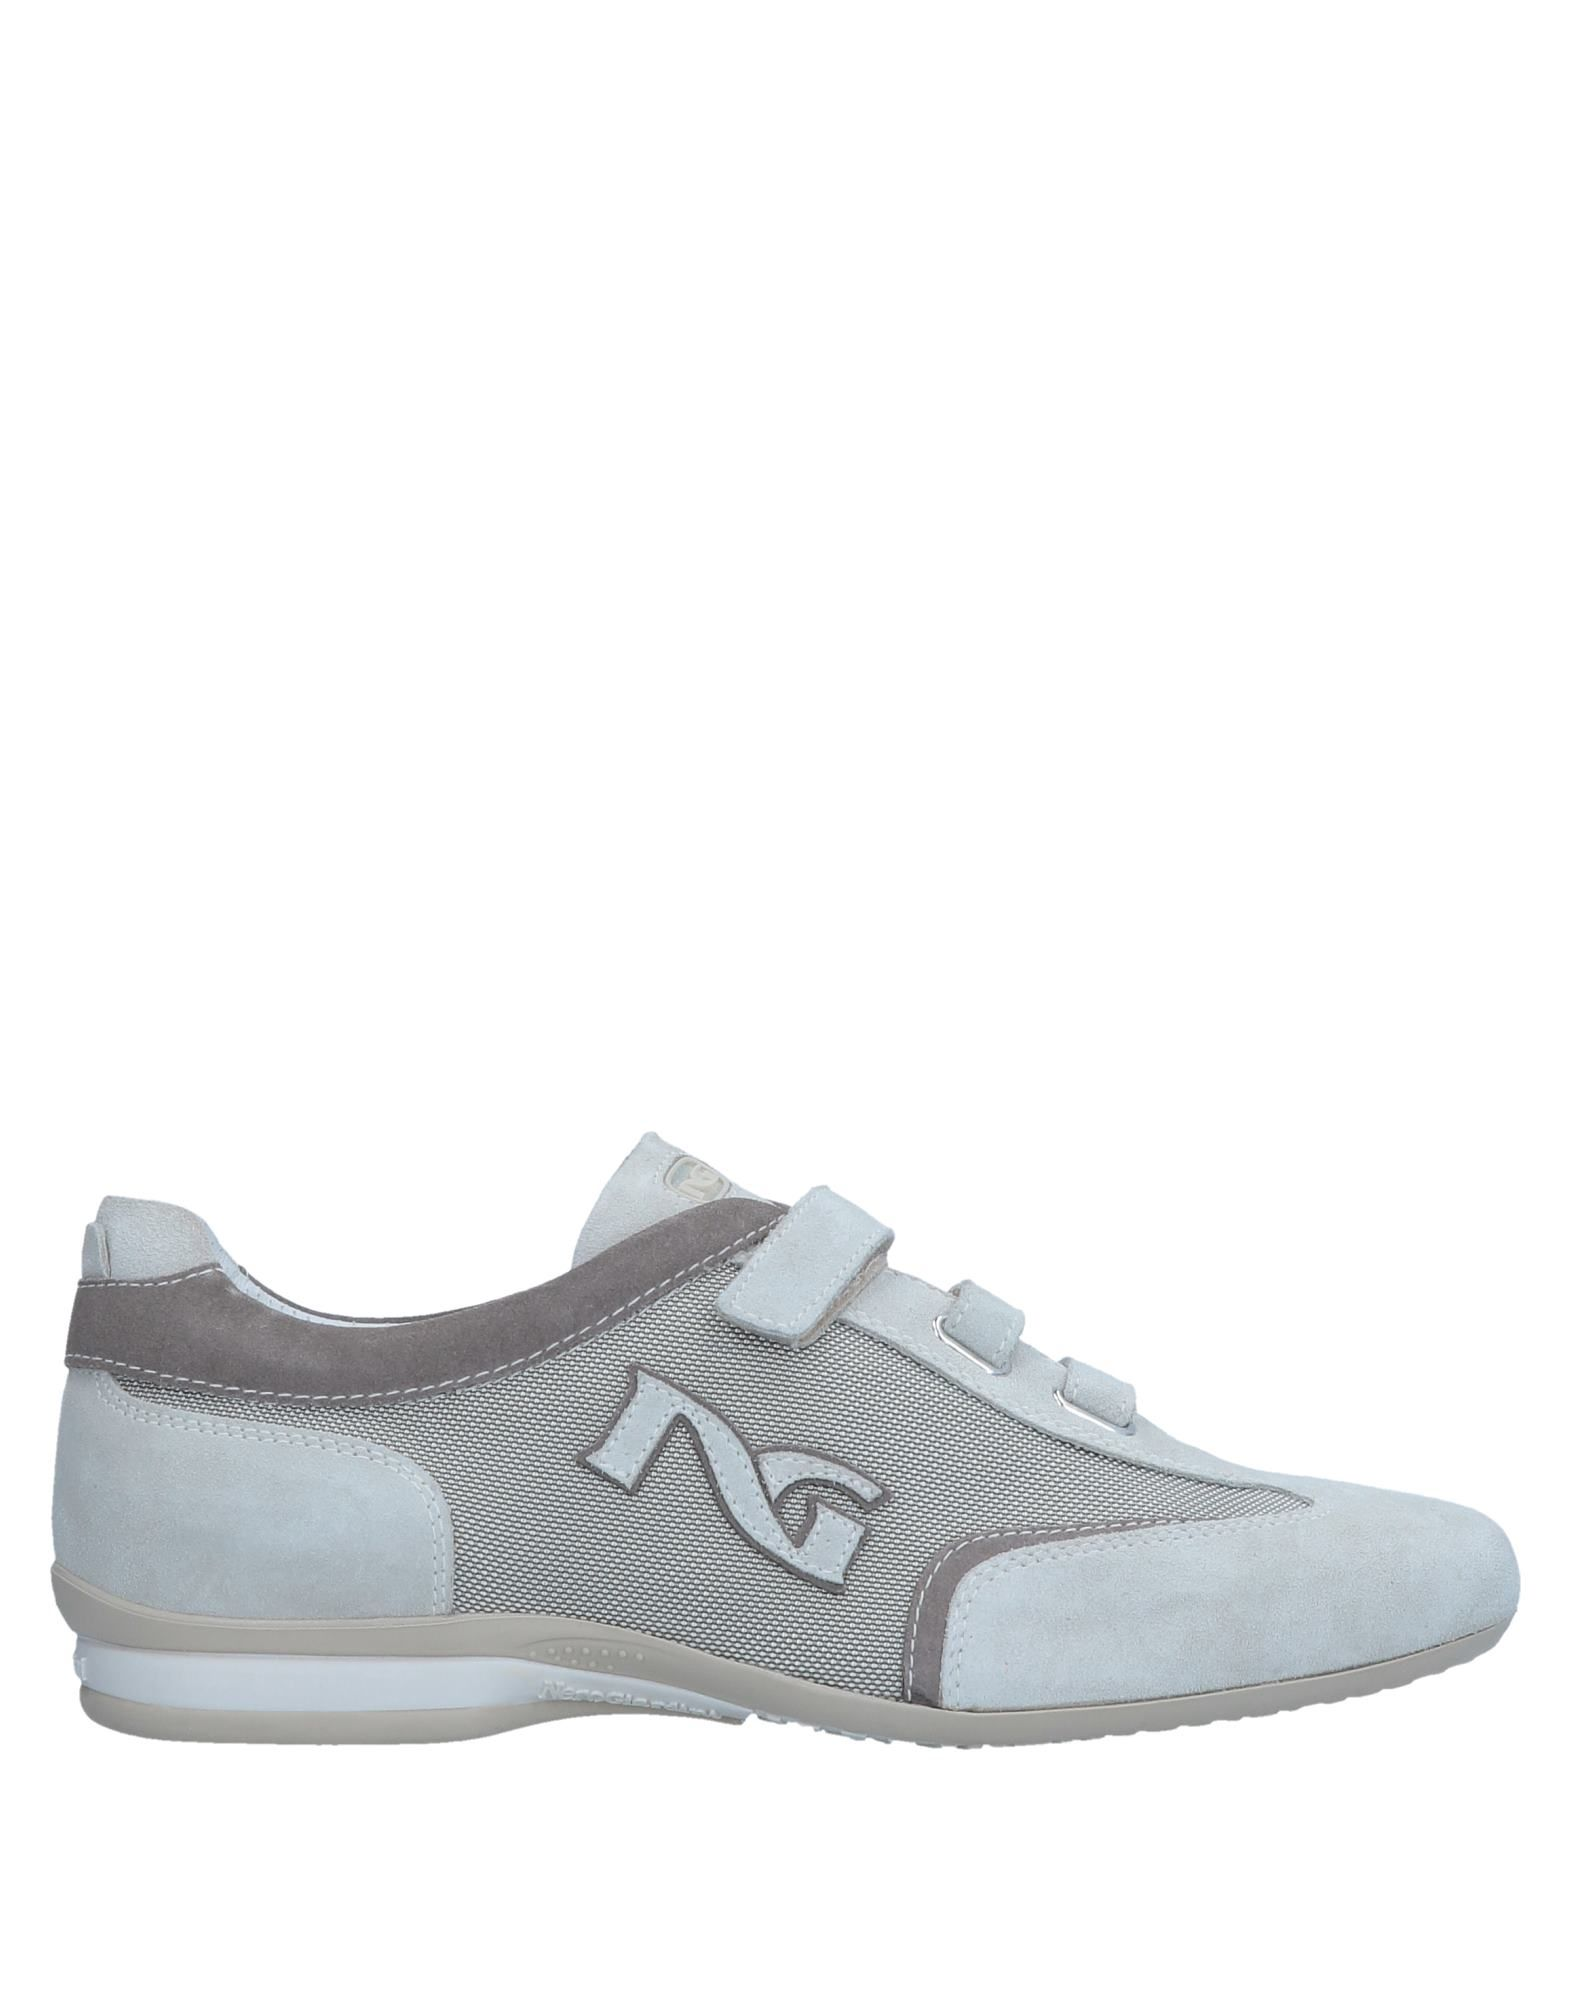 Sneakers Ng Nero Giardini Donna - 11548823QP